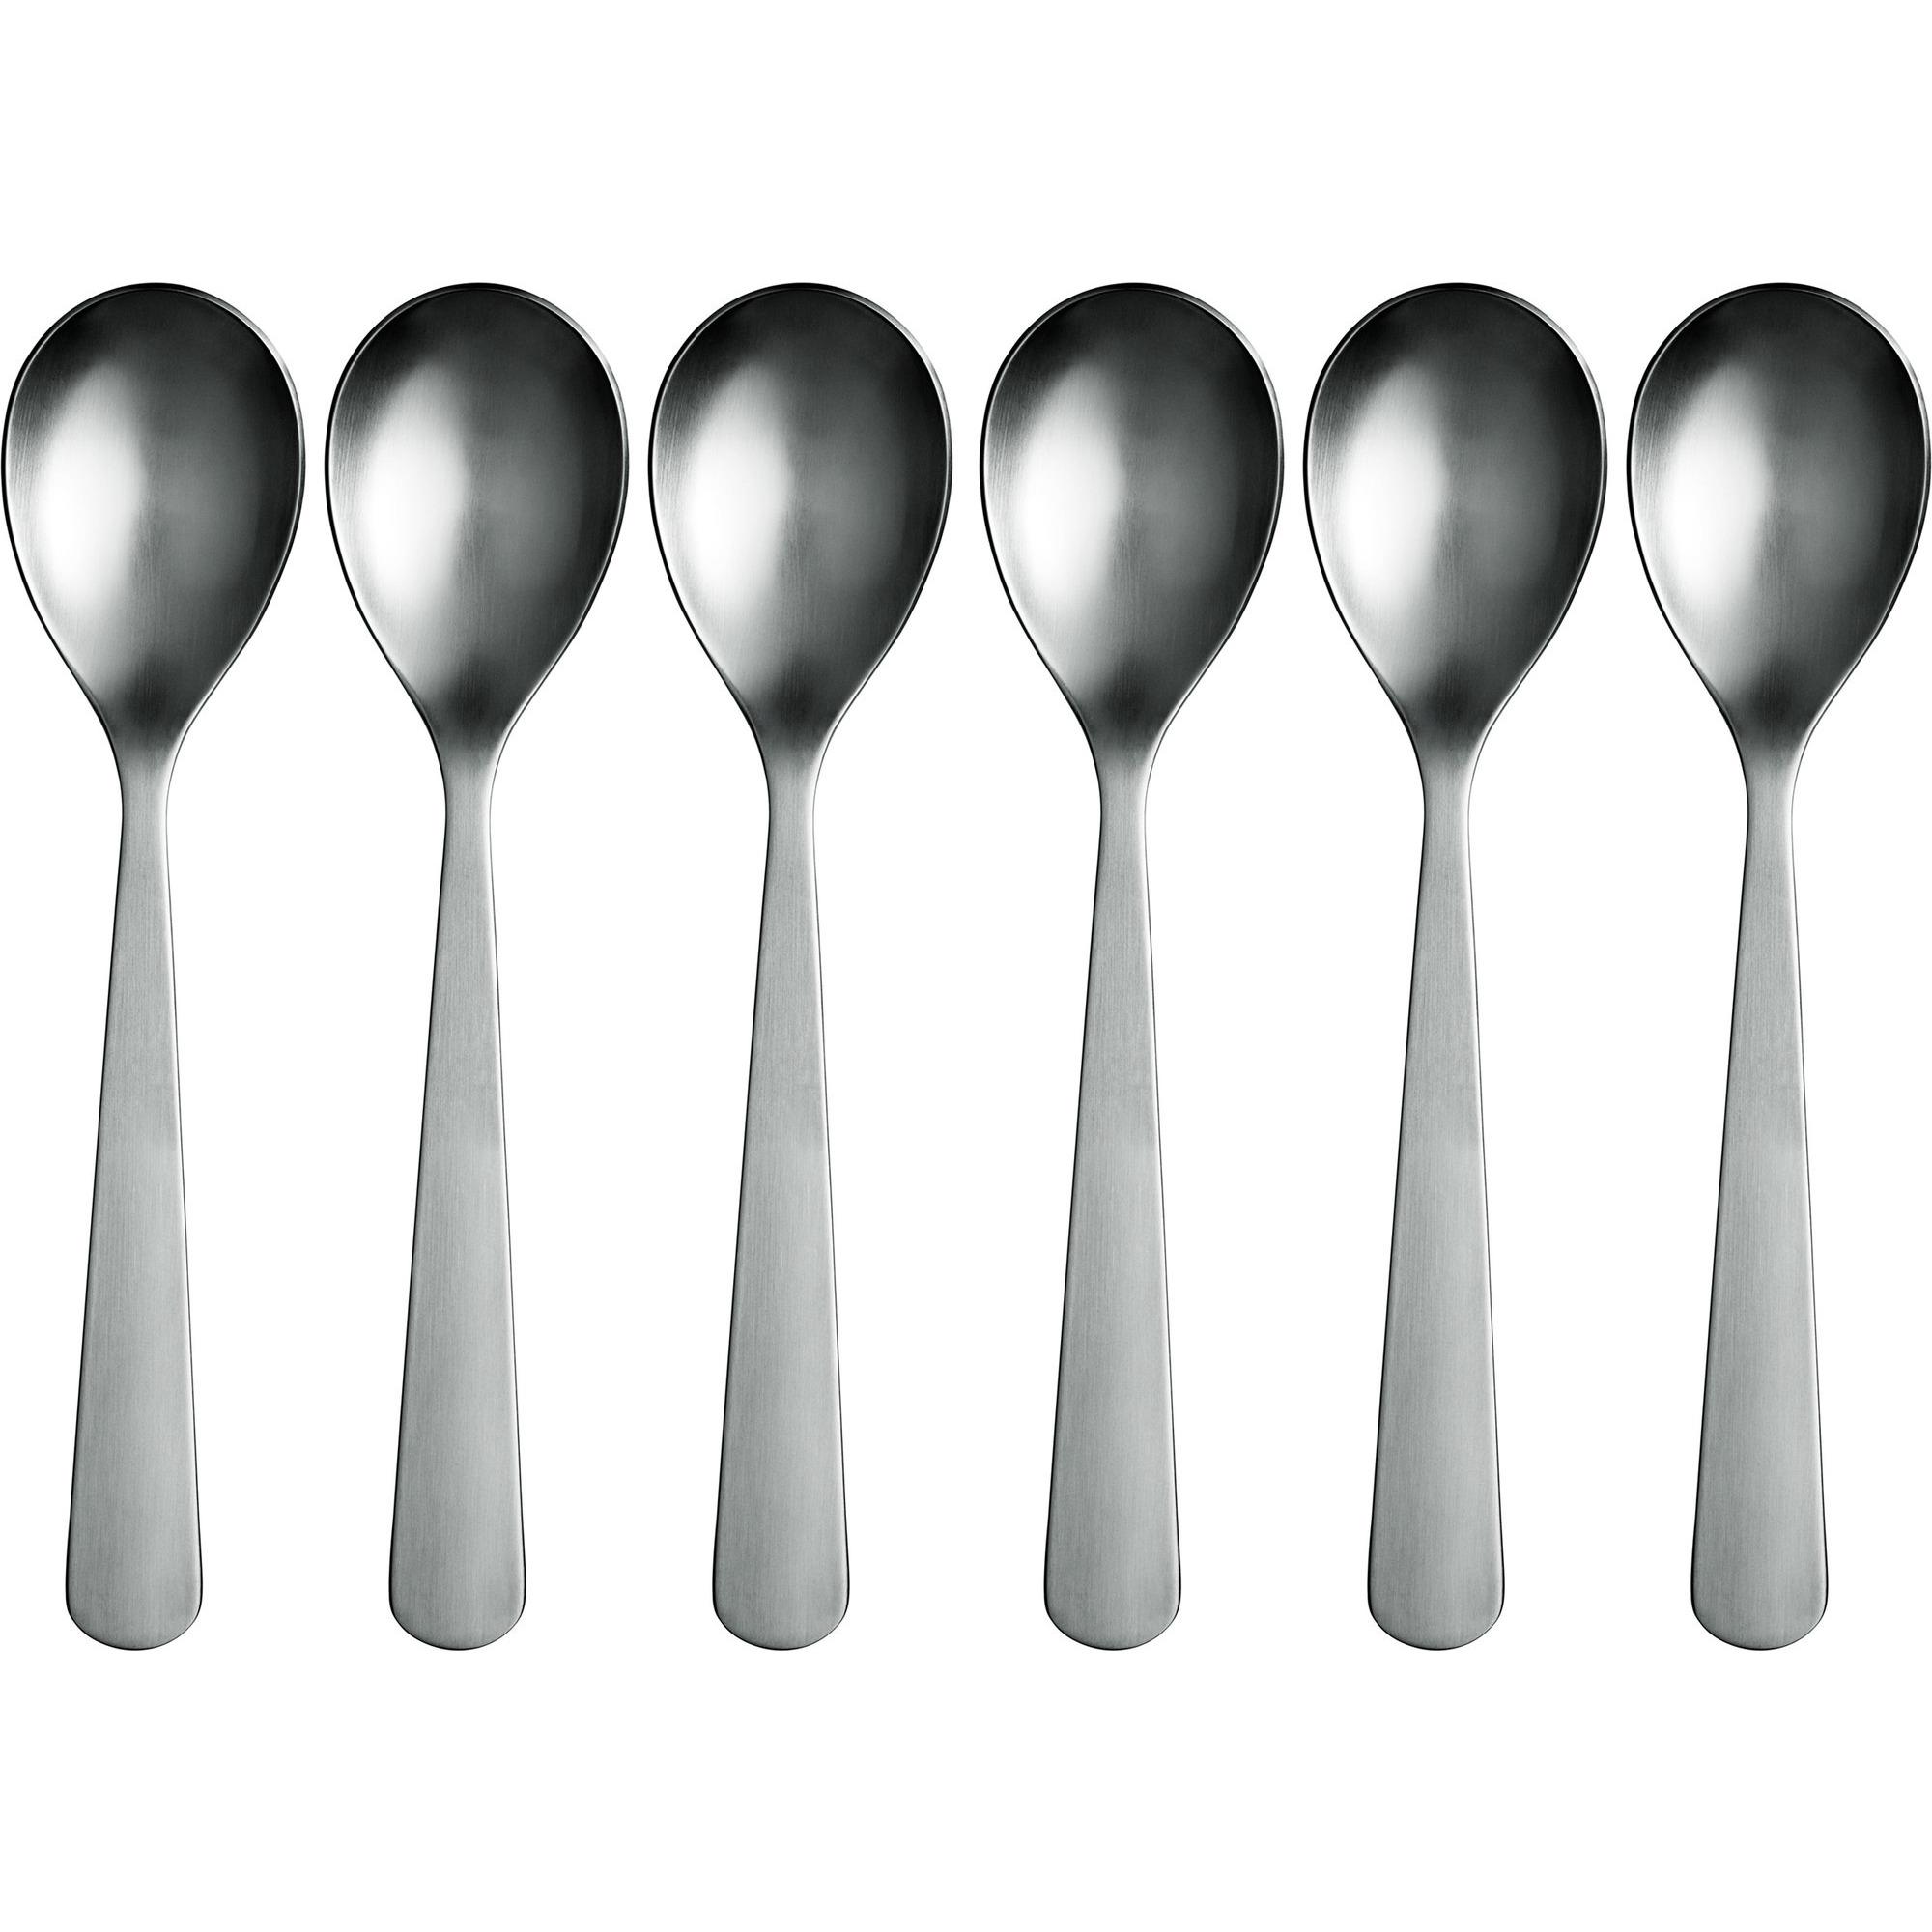 Normann Copenhagen Normann Spoons – 6 pack Steel